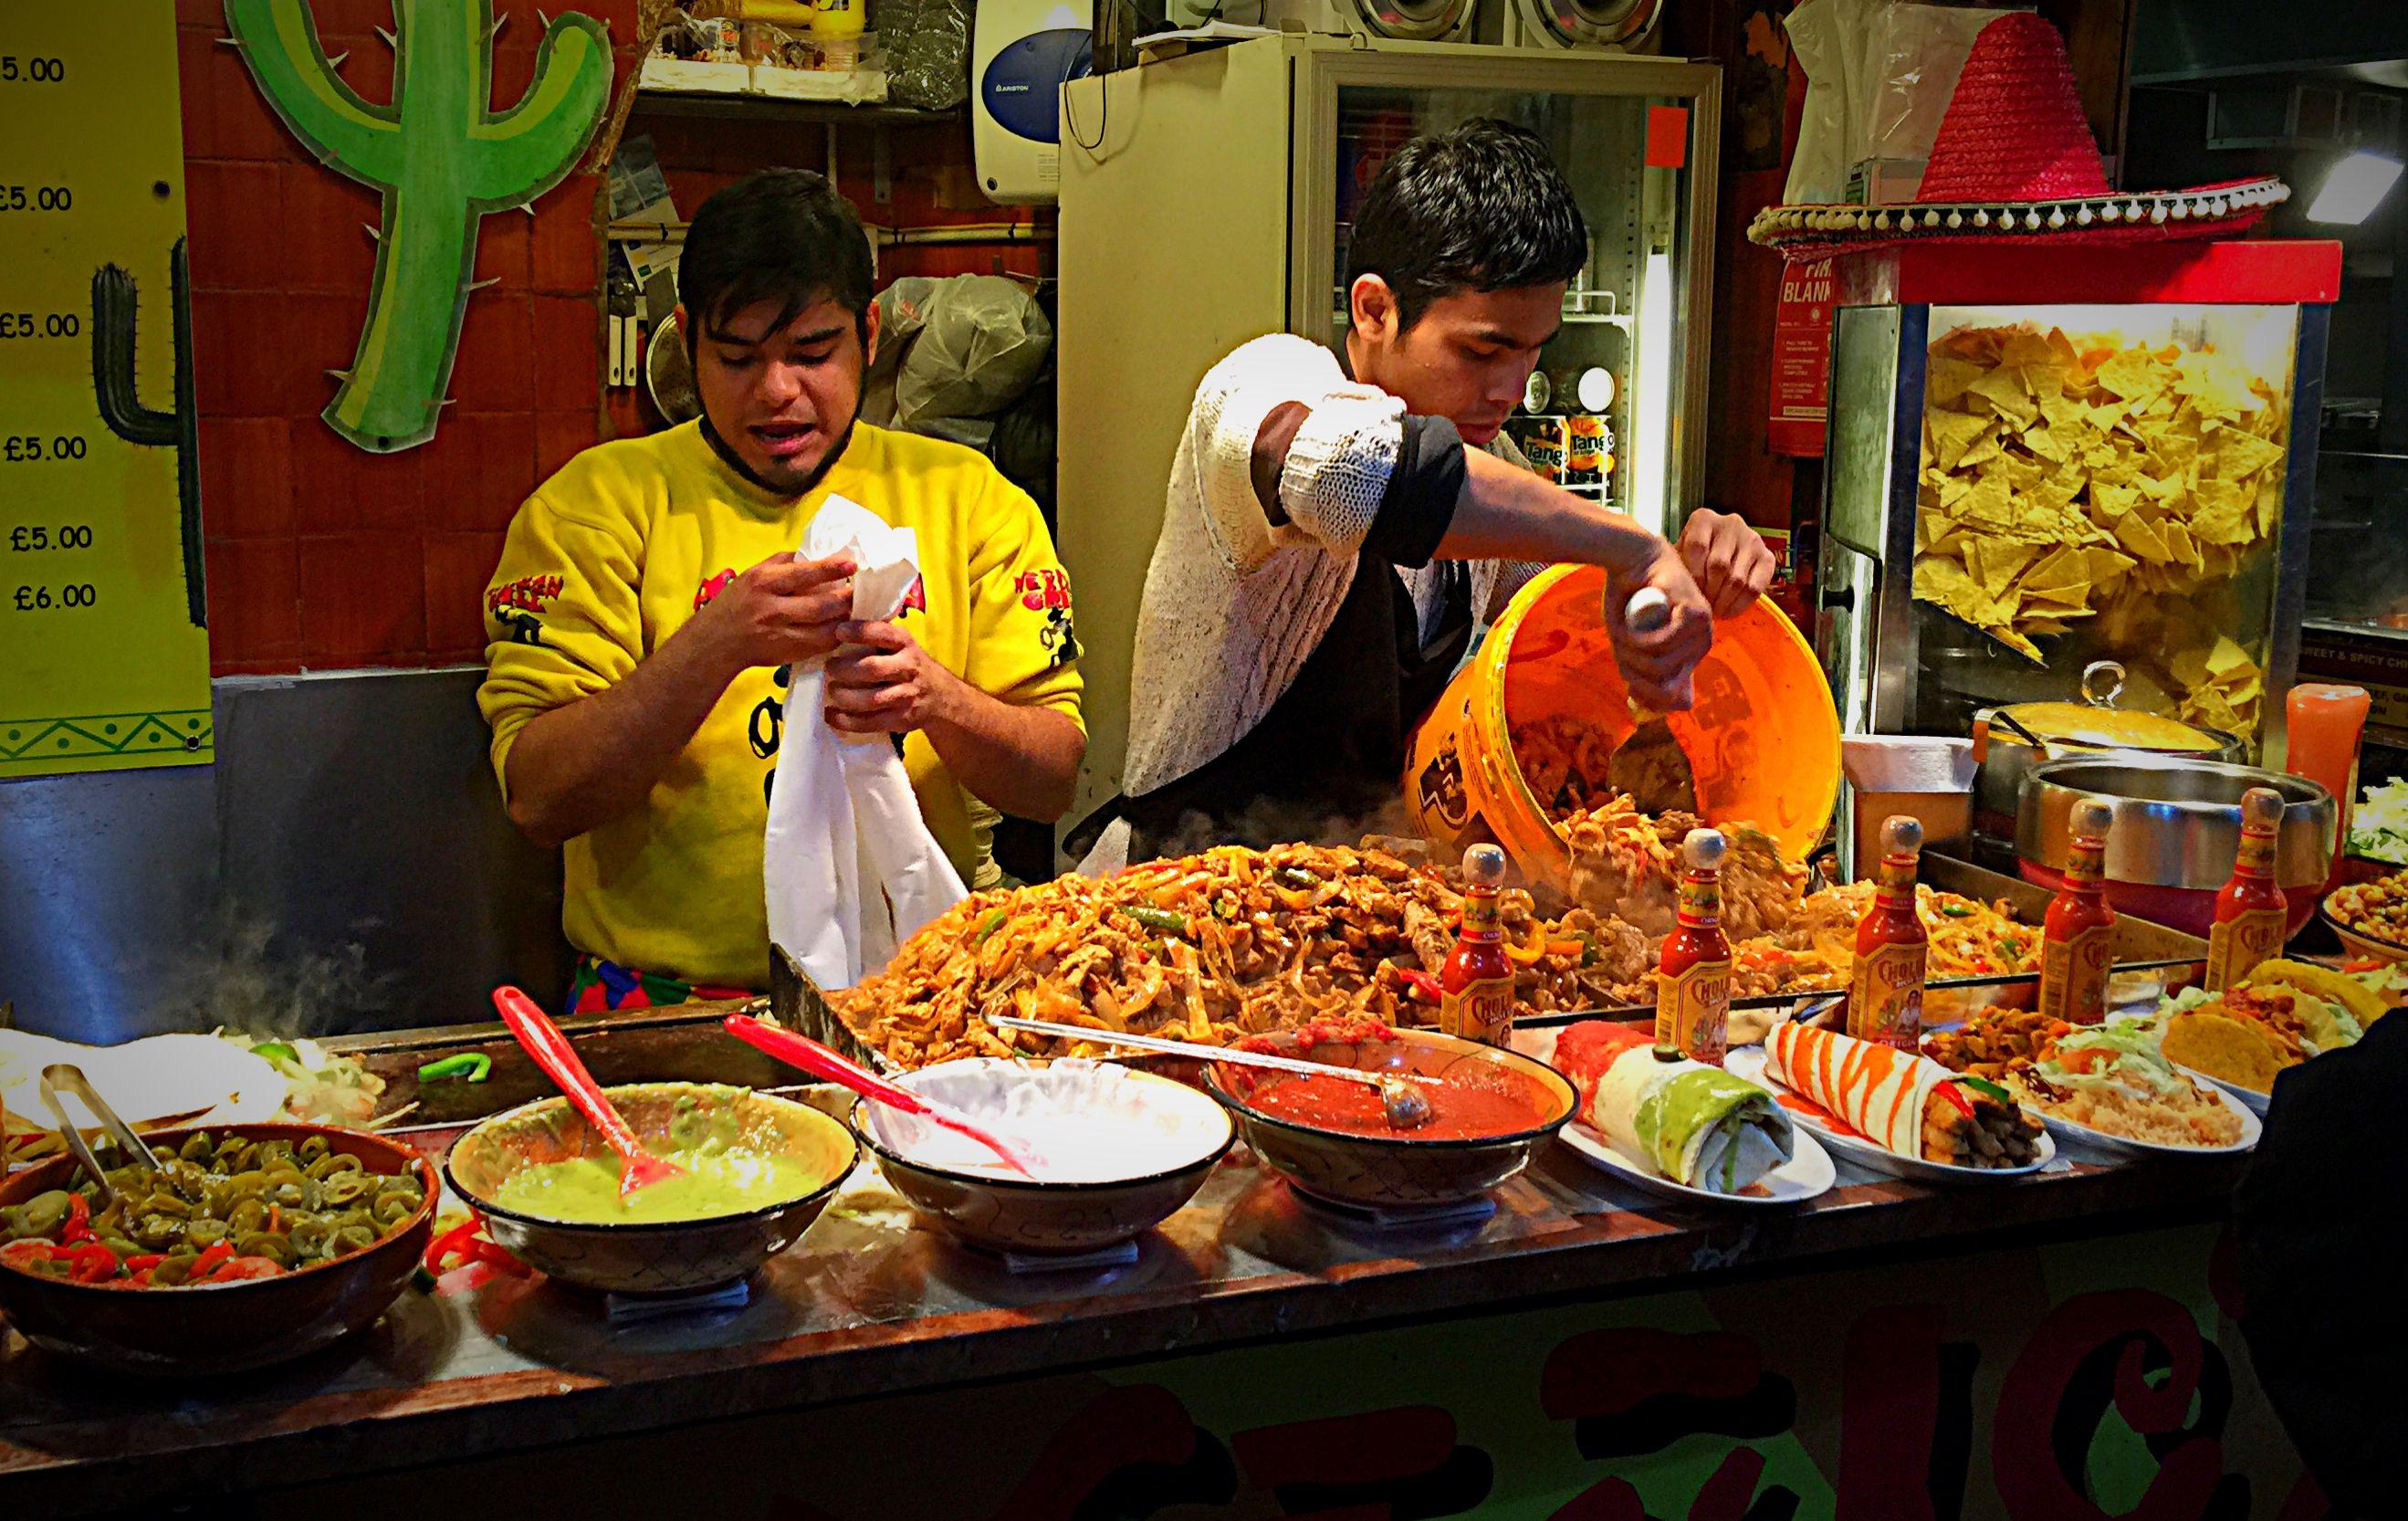 Mexican Fajita, Camden Market Street food, January 2015